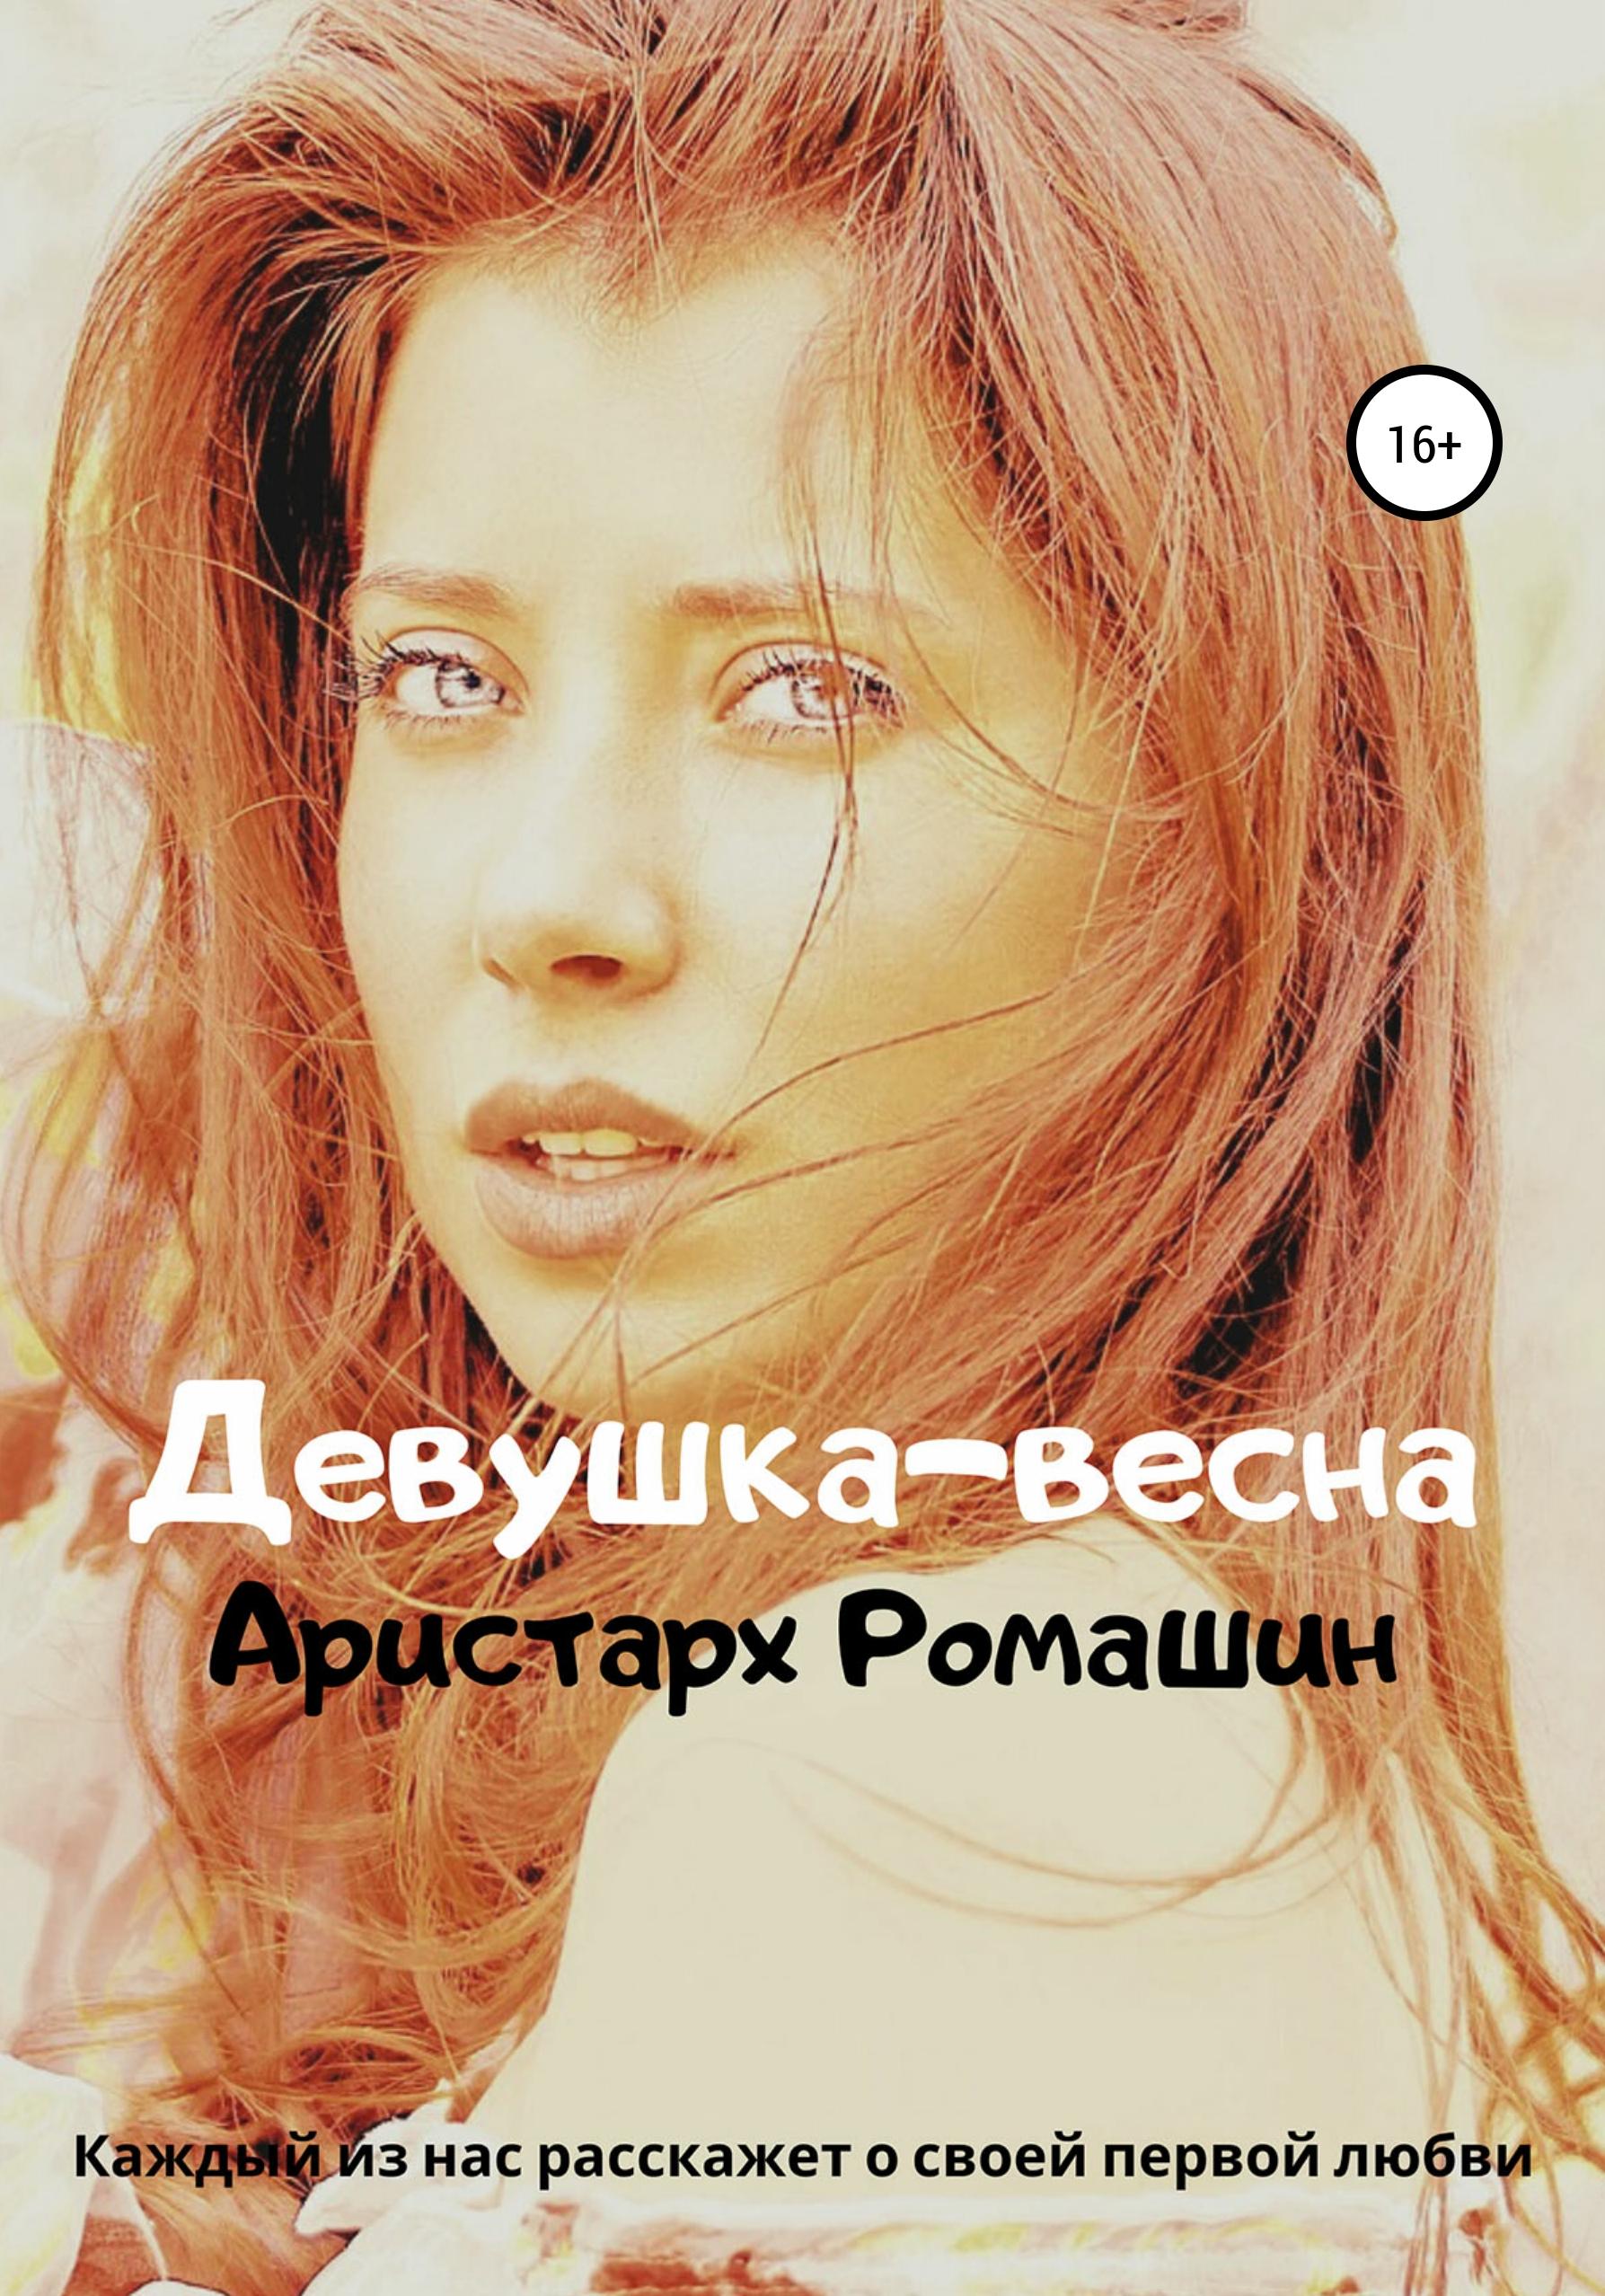 Аристарх Ромашин Девушка-весна аристарх ромашин призраки